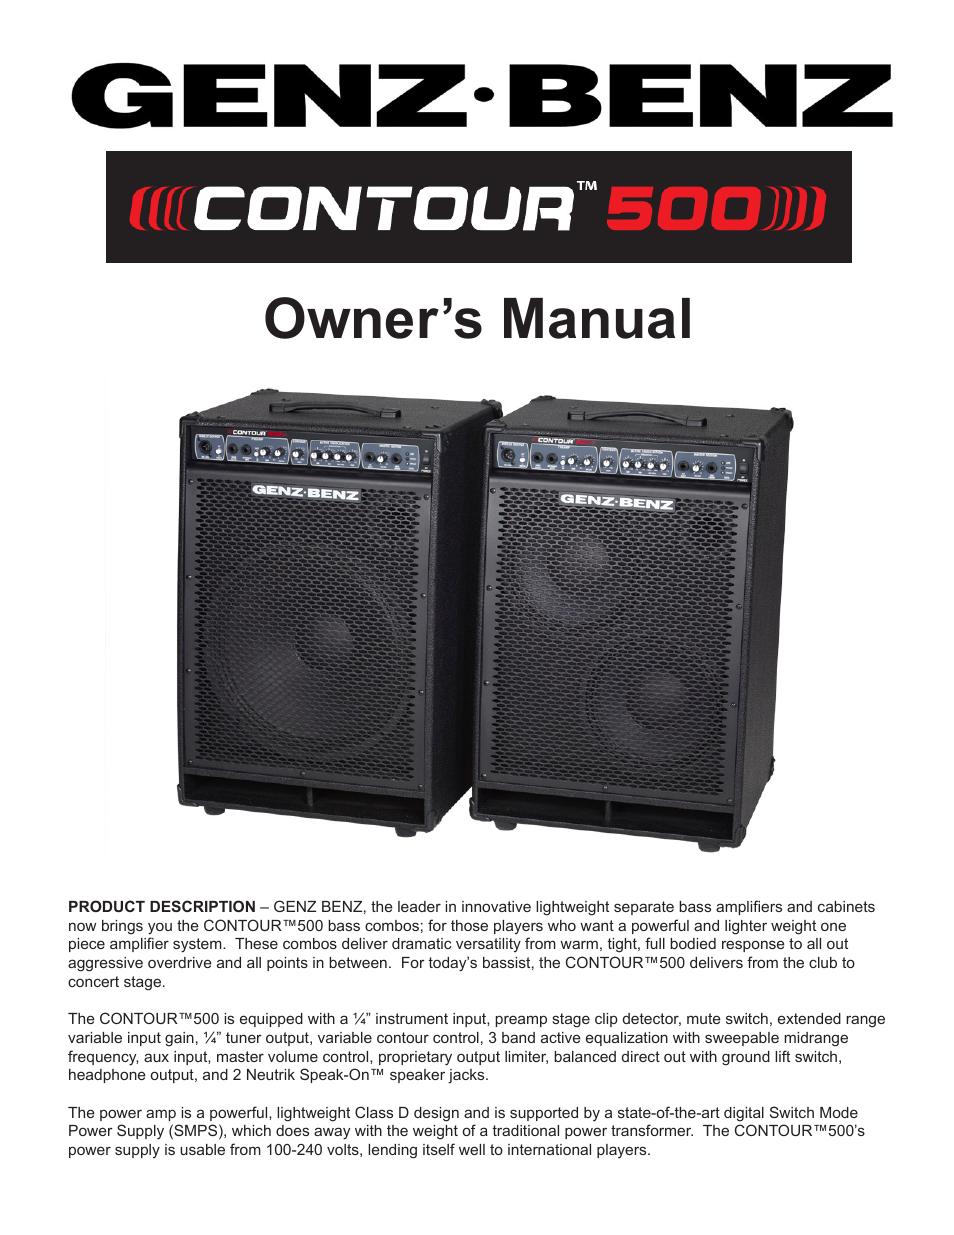 Genz Benz Contour 500 User Manual 7 Pages